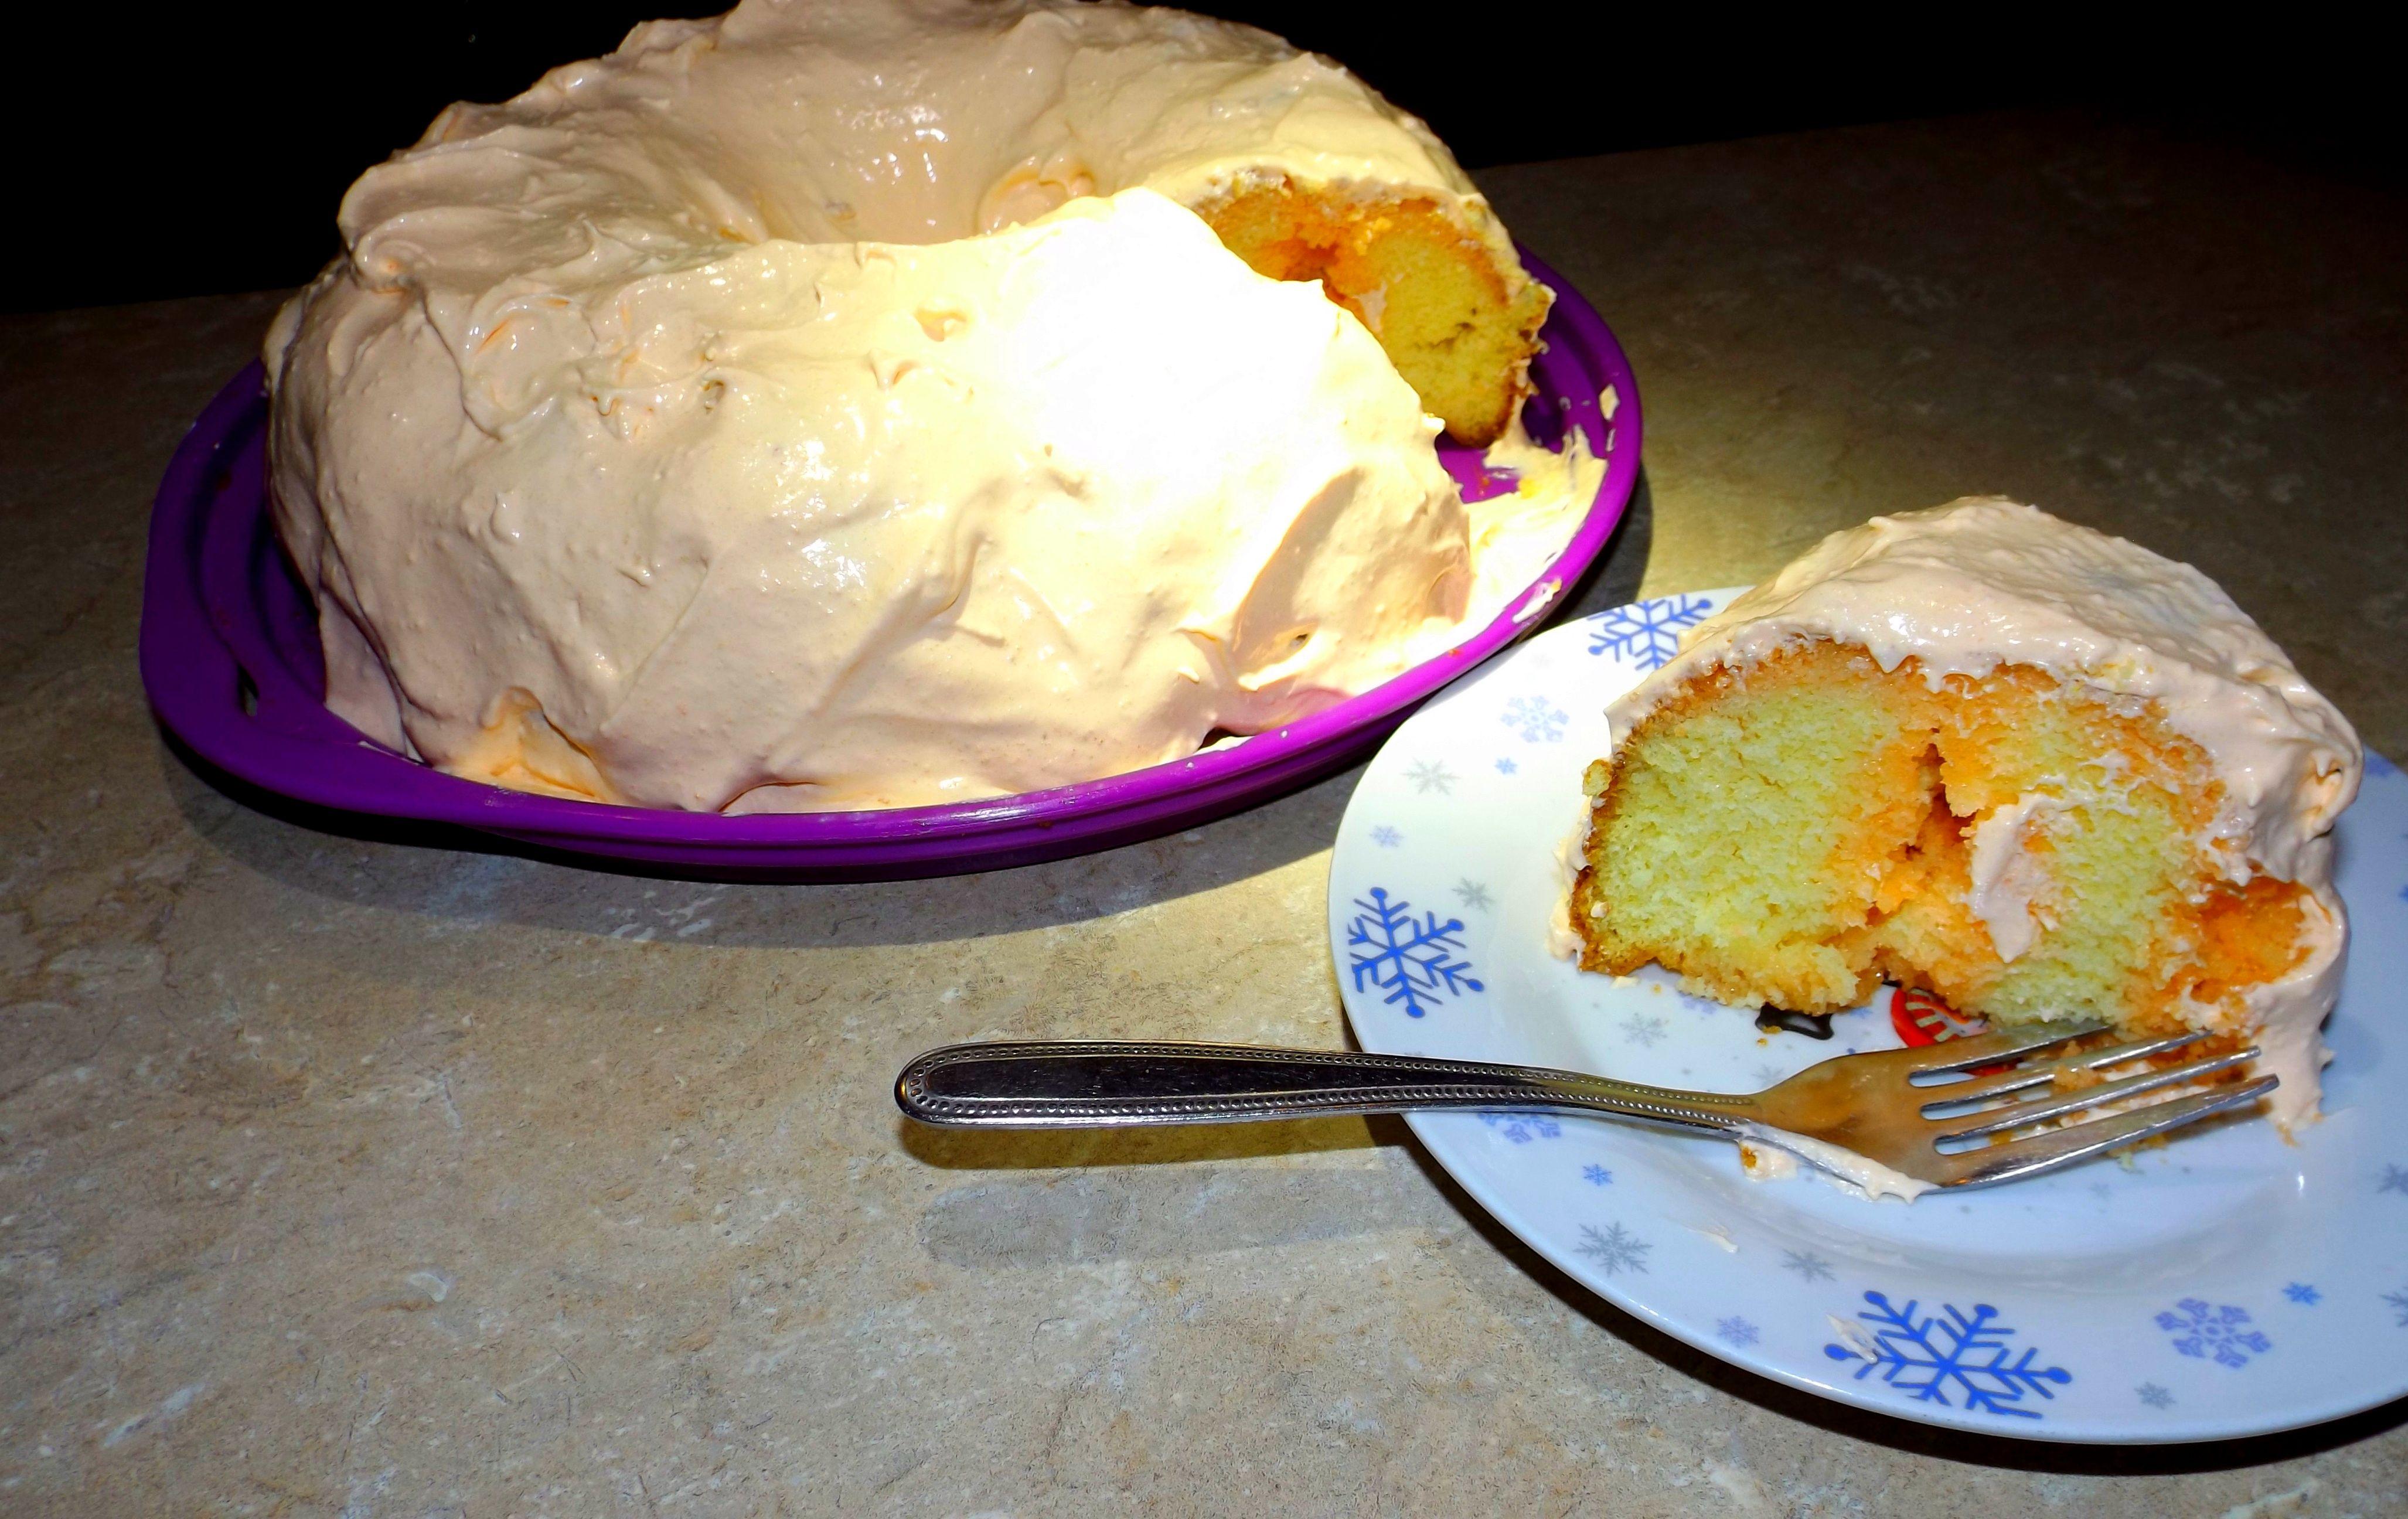 Creamsicle cake creamsicle cake creamsicle desserts